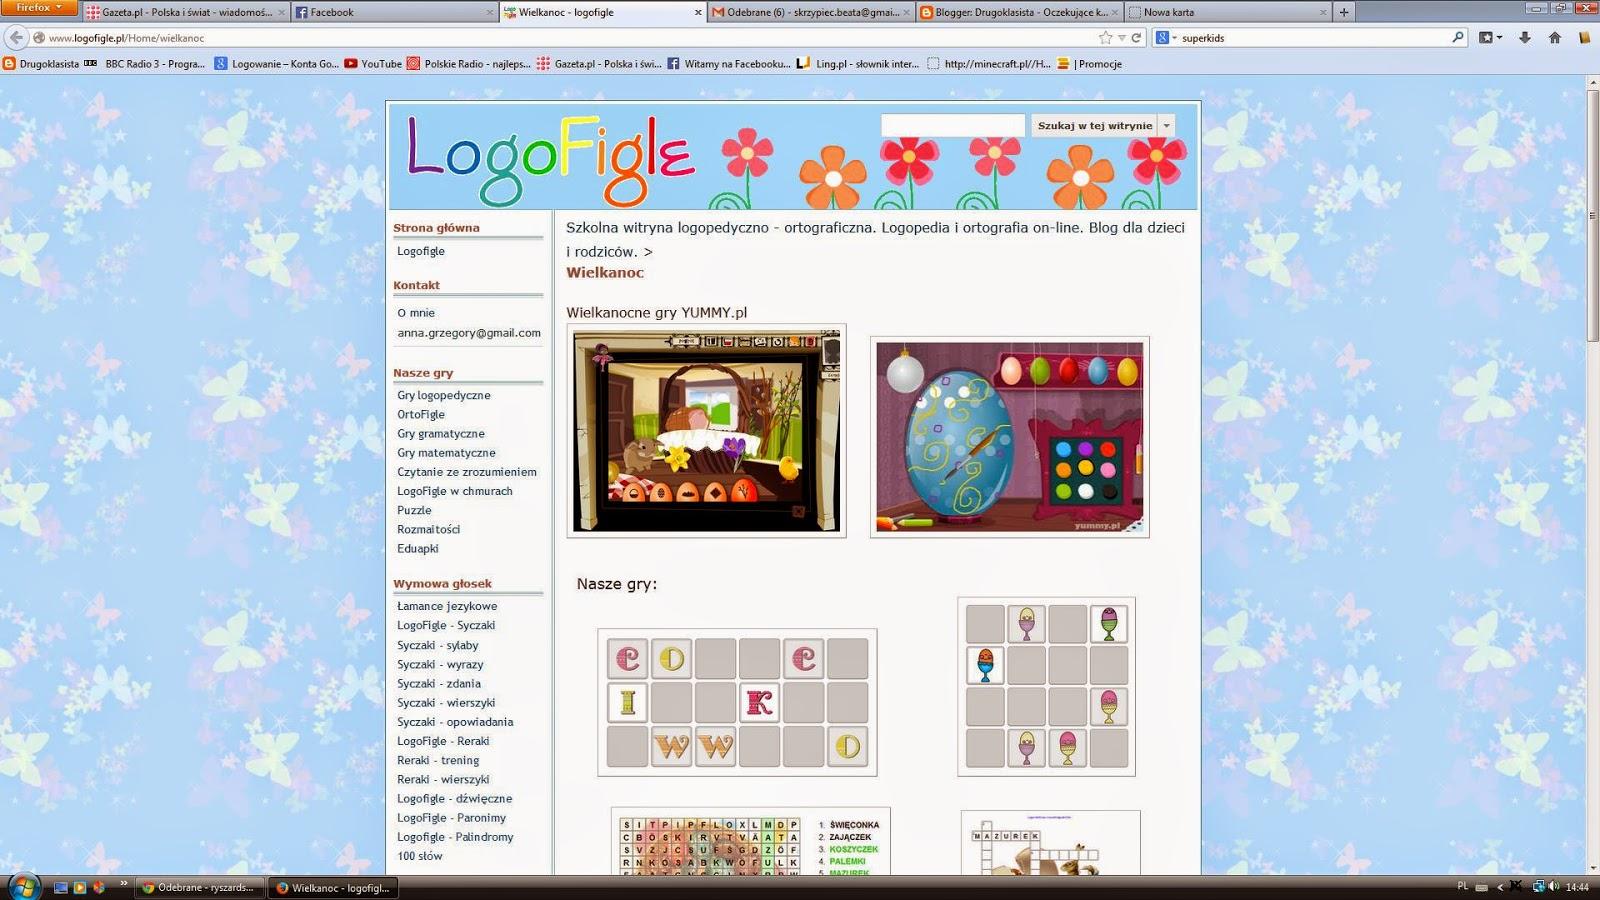 http://www.logofigle.pl/Home/wielkanoc